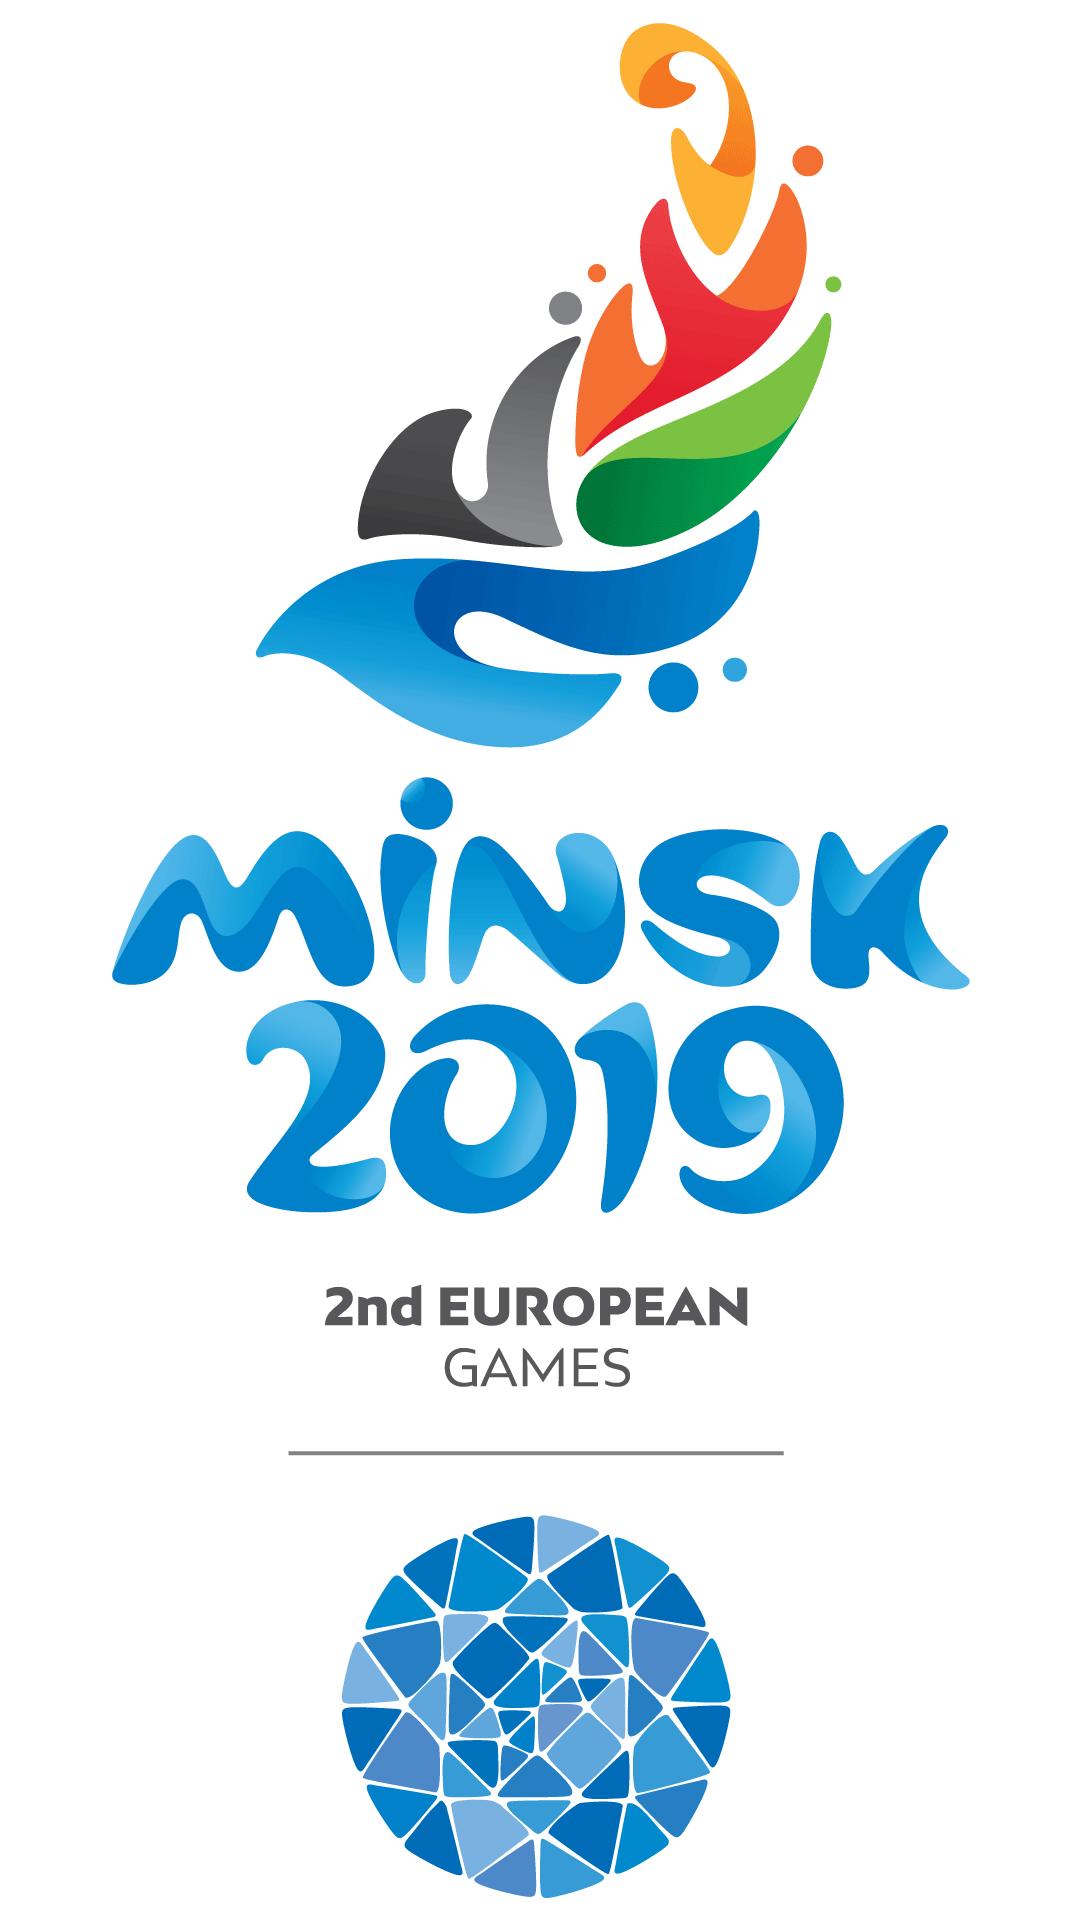 http://sovjkh.by/wp-content/uploads/2019/05/Minsk_2019_Logo.png